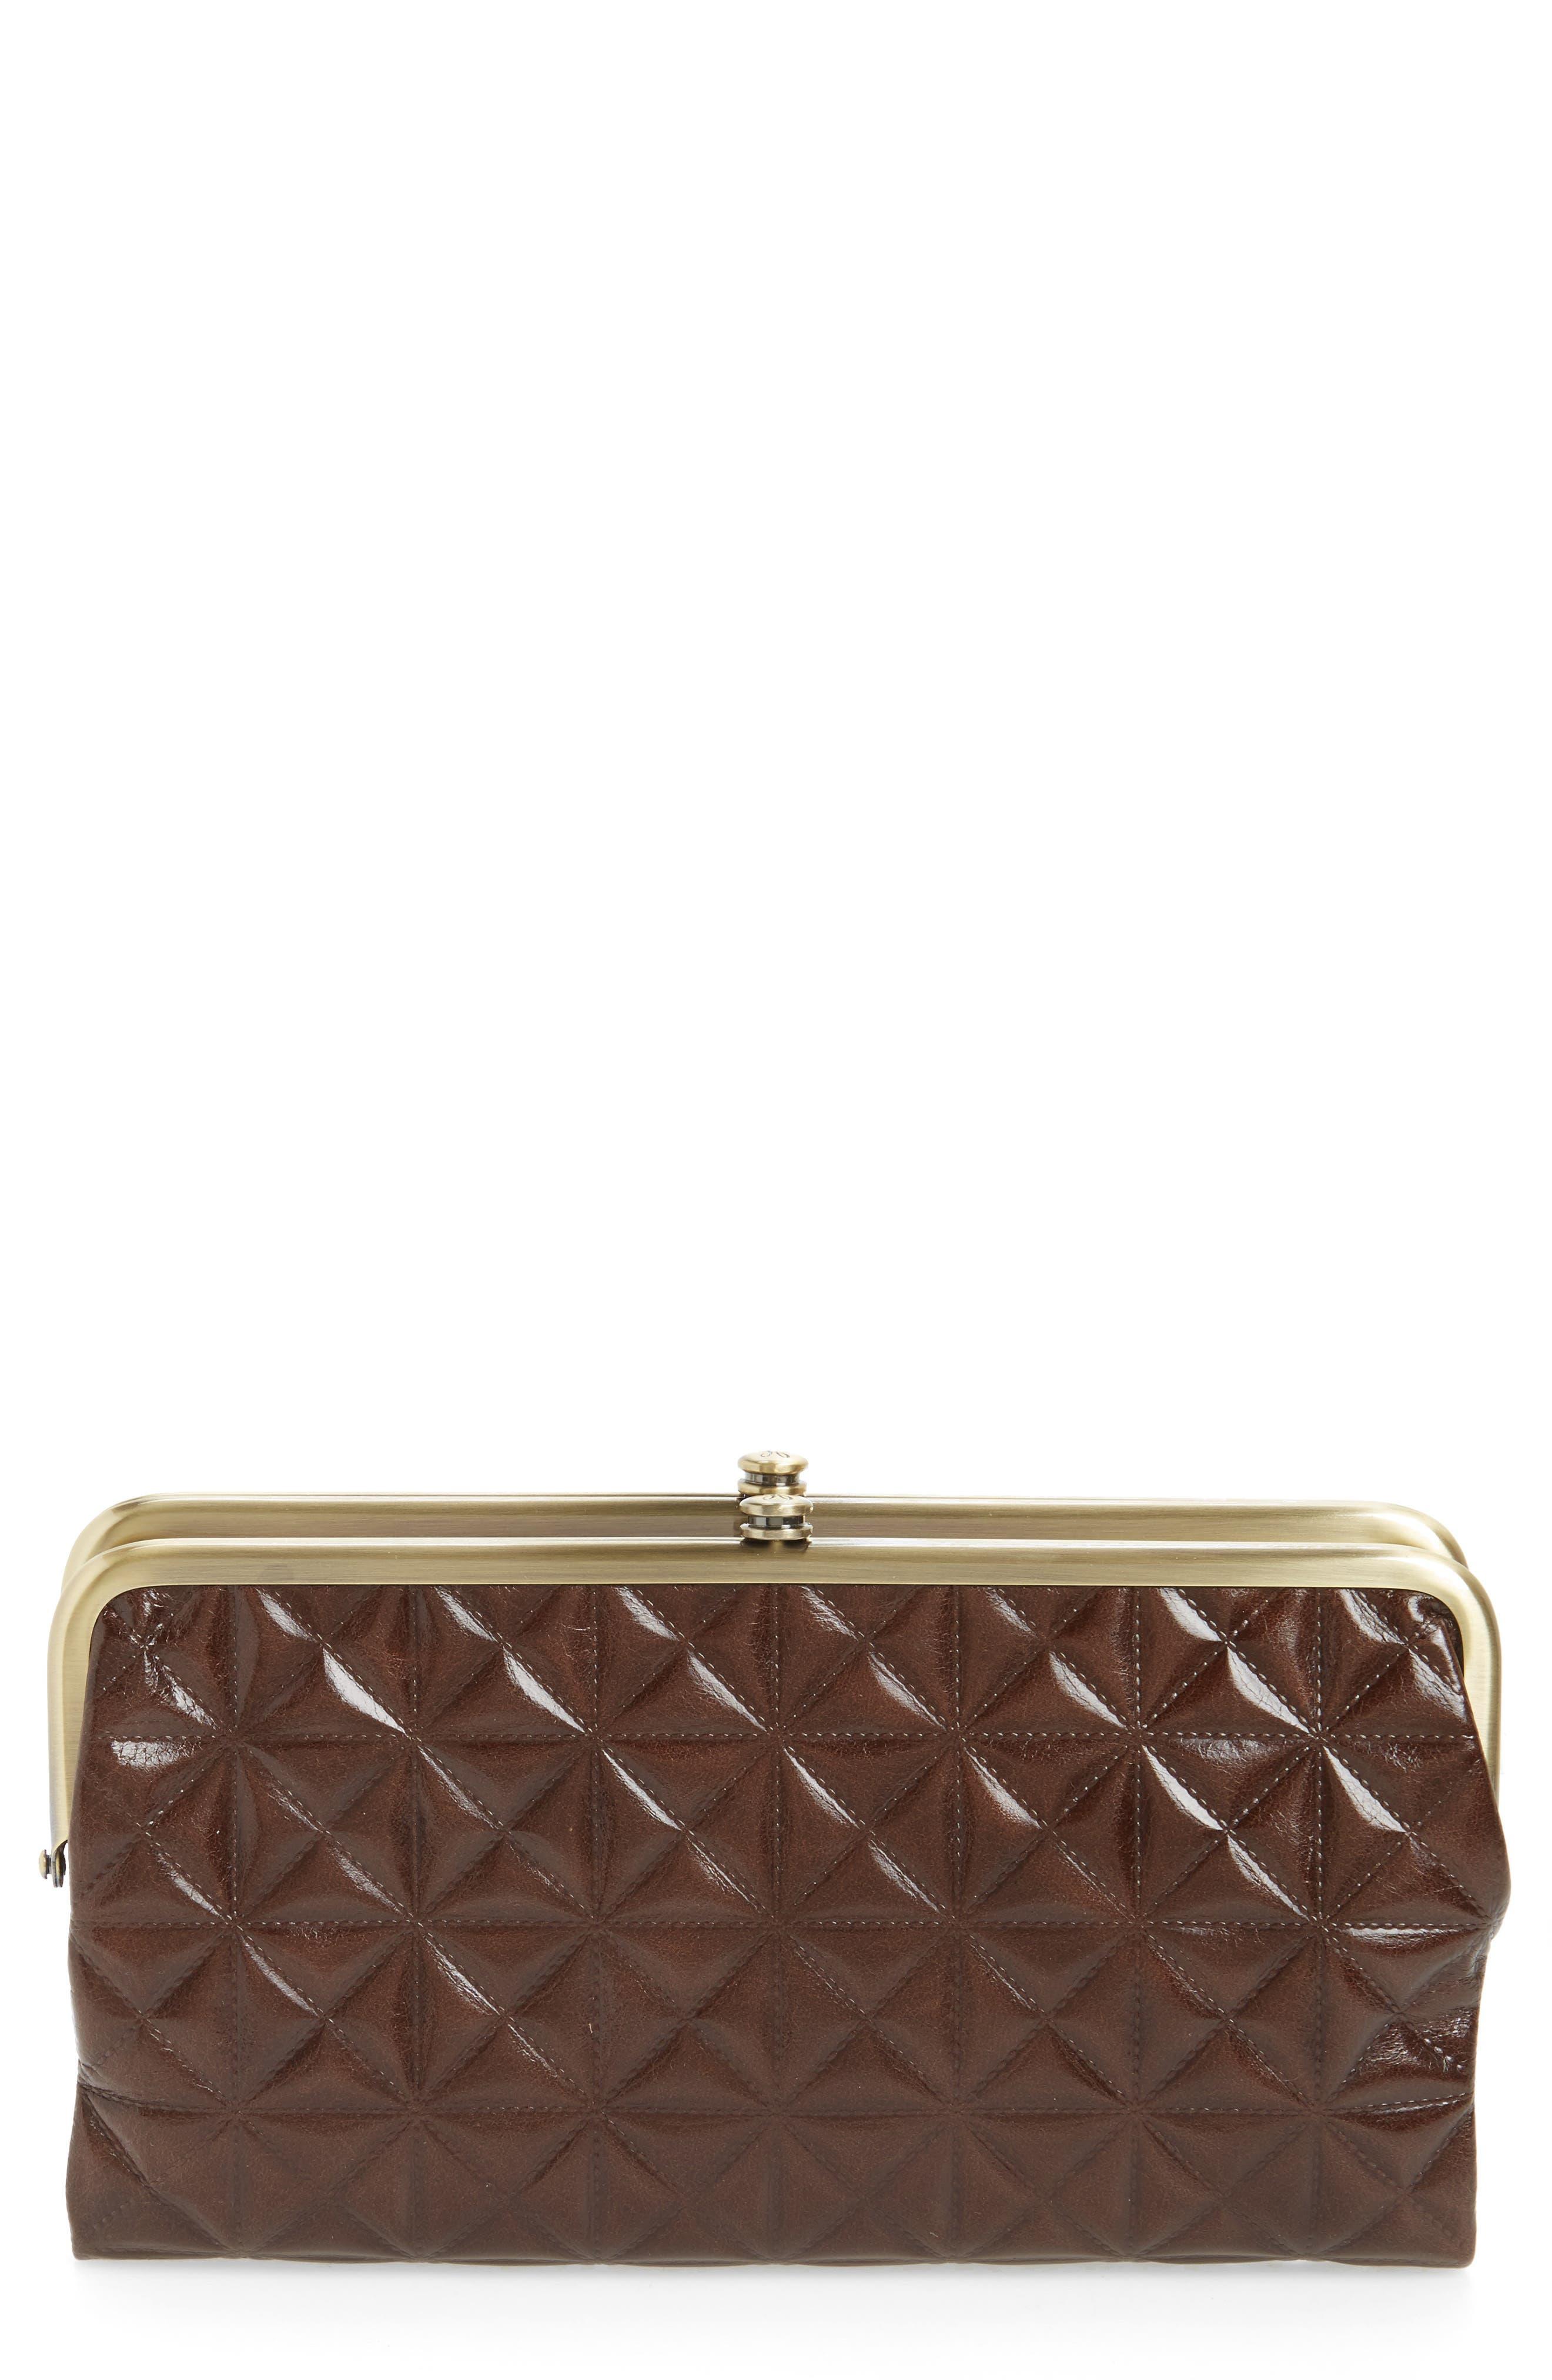 Main Image - Hobo Lauren Quilted Calfskin Leather Wallet